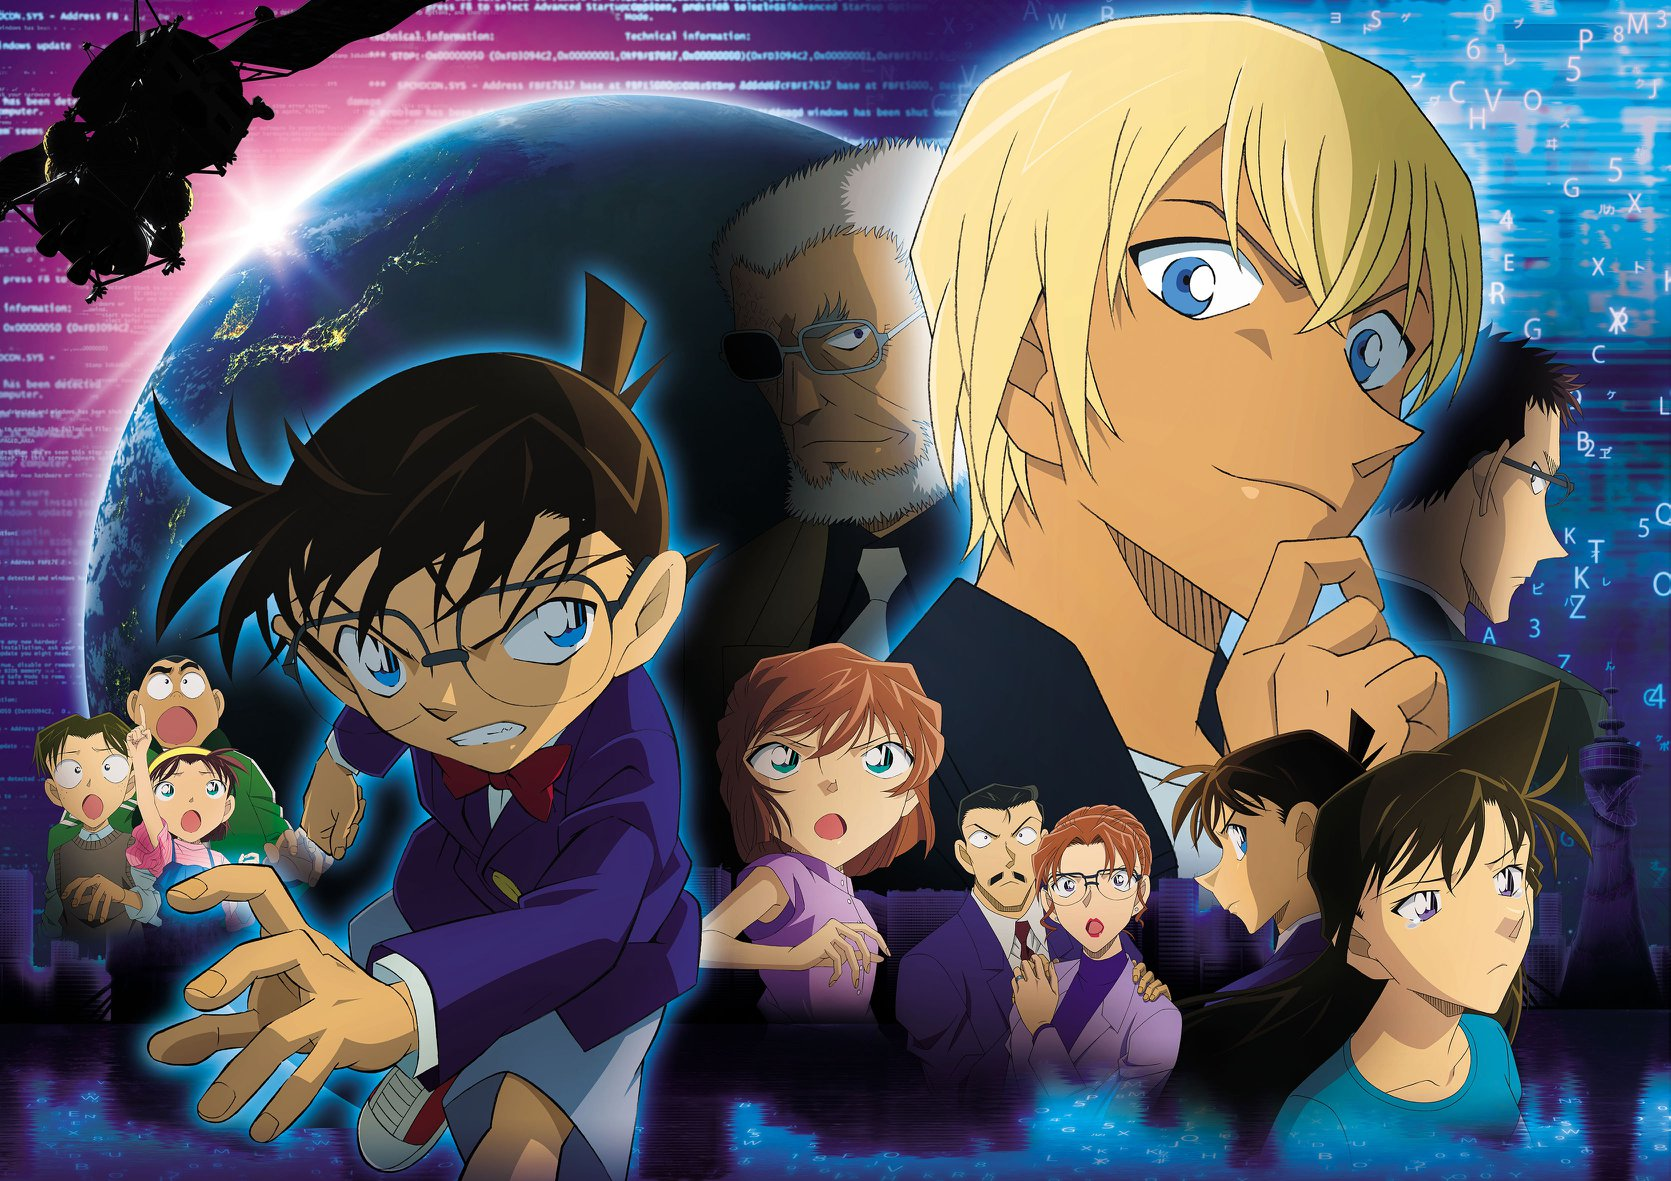 Detective Conan Zero The Enforcer 4dx Anime Expo 2019 Premiere